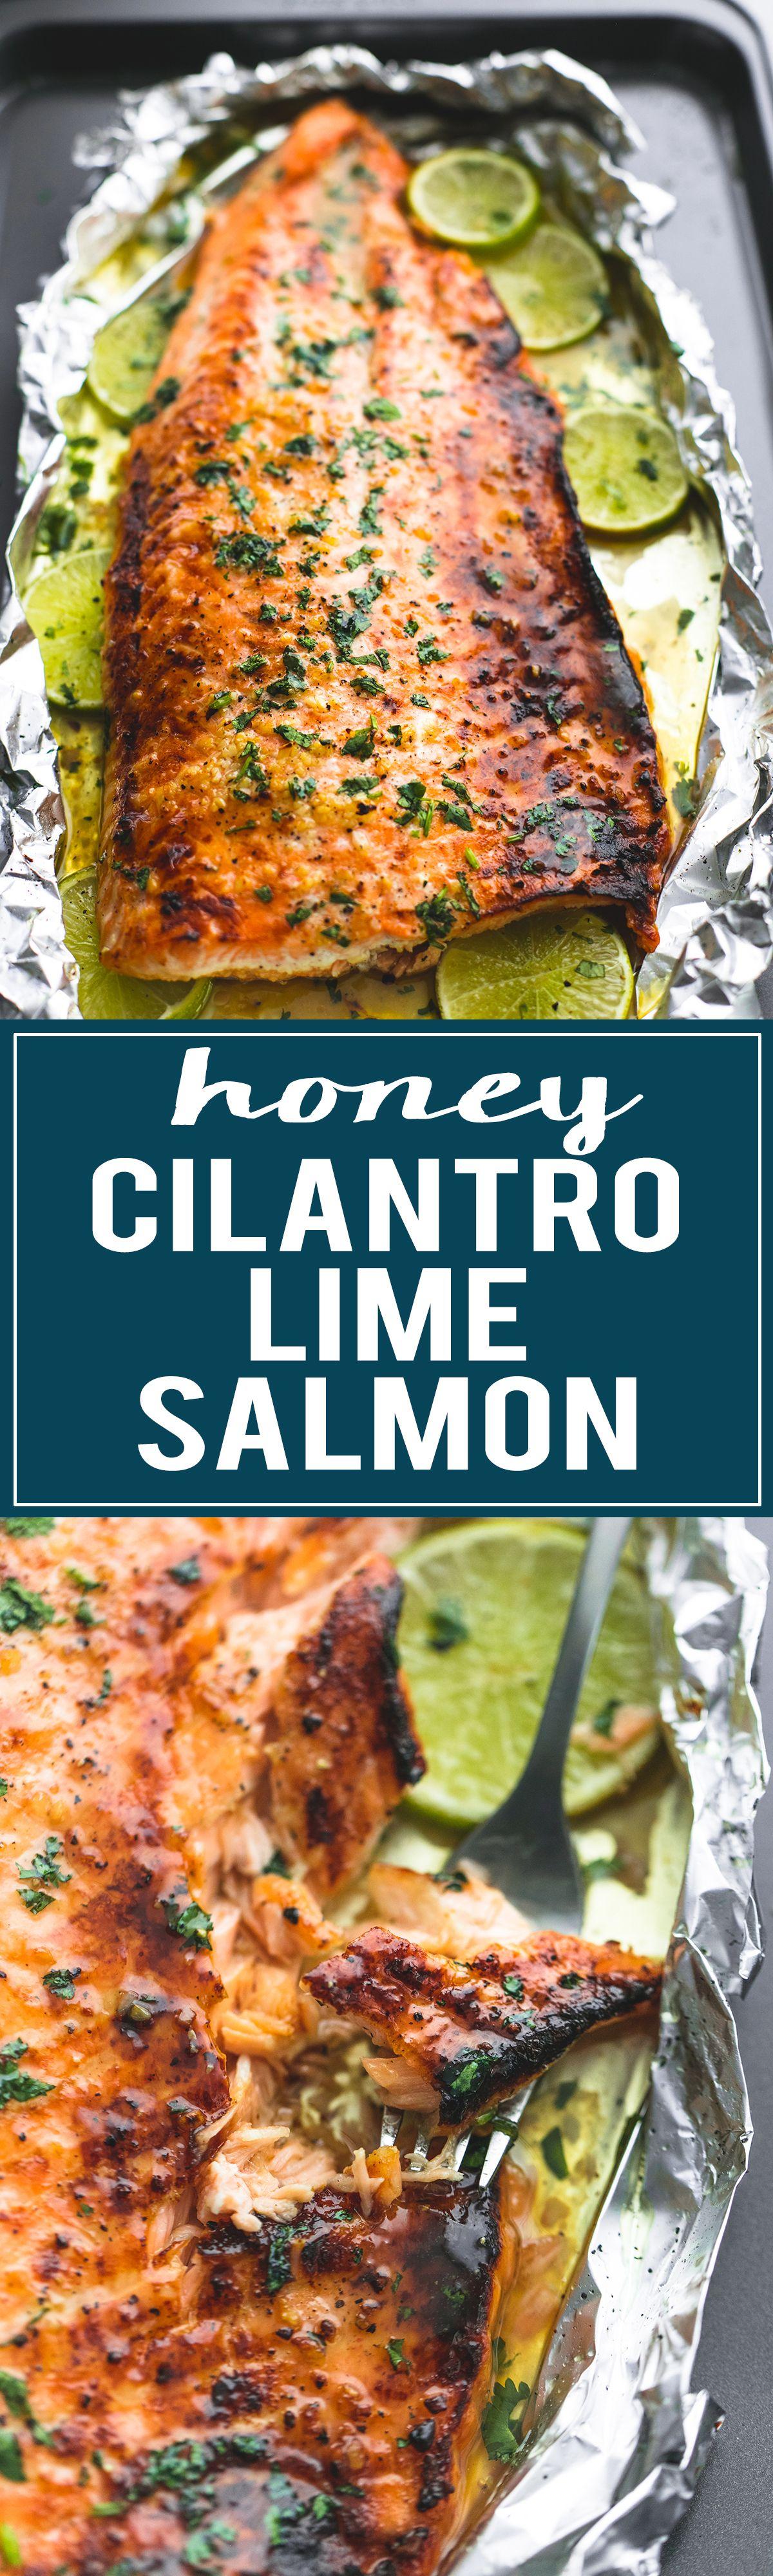 Photo of Baked Honey Cilantro Lime Salmon in Foil | Creme De La Crumb